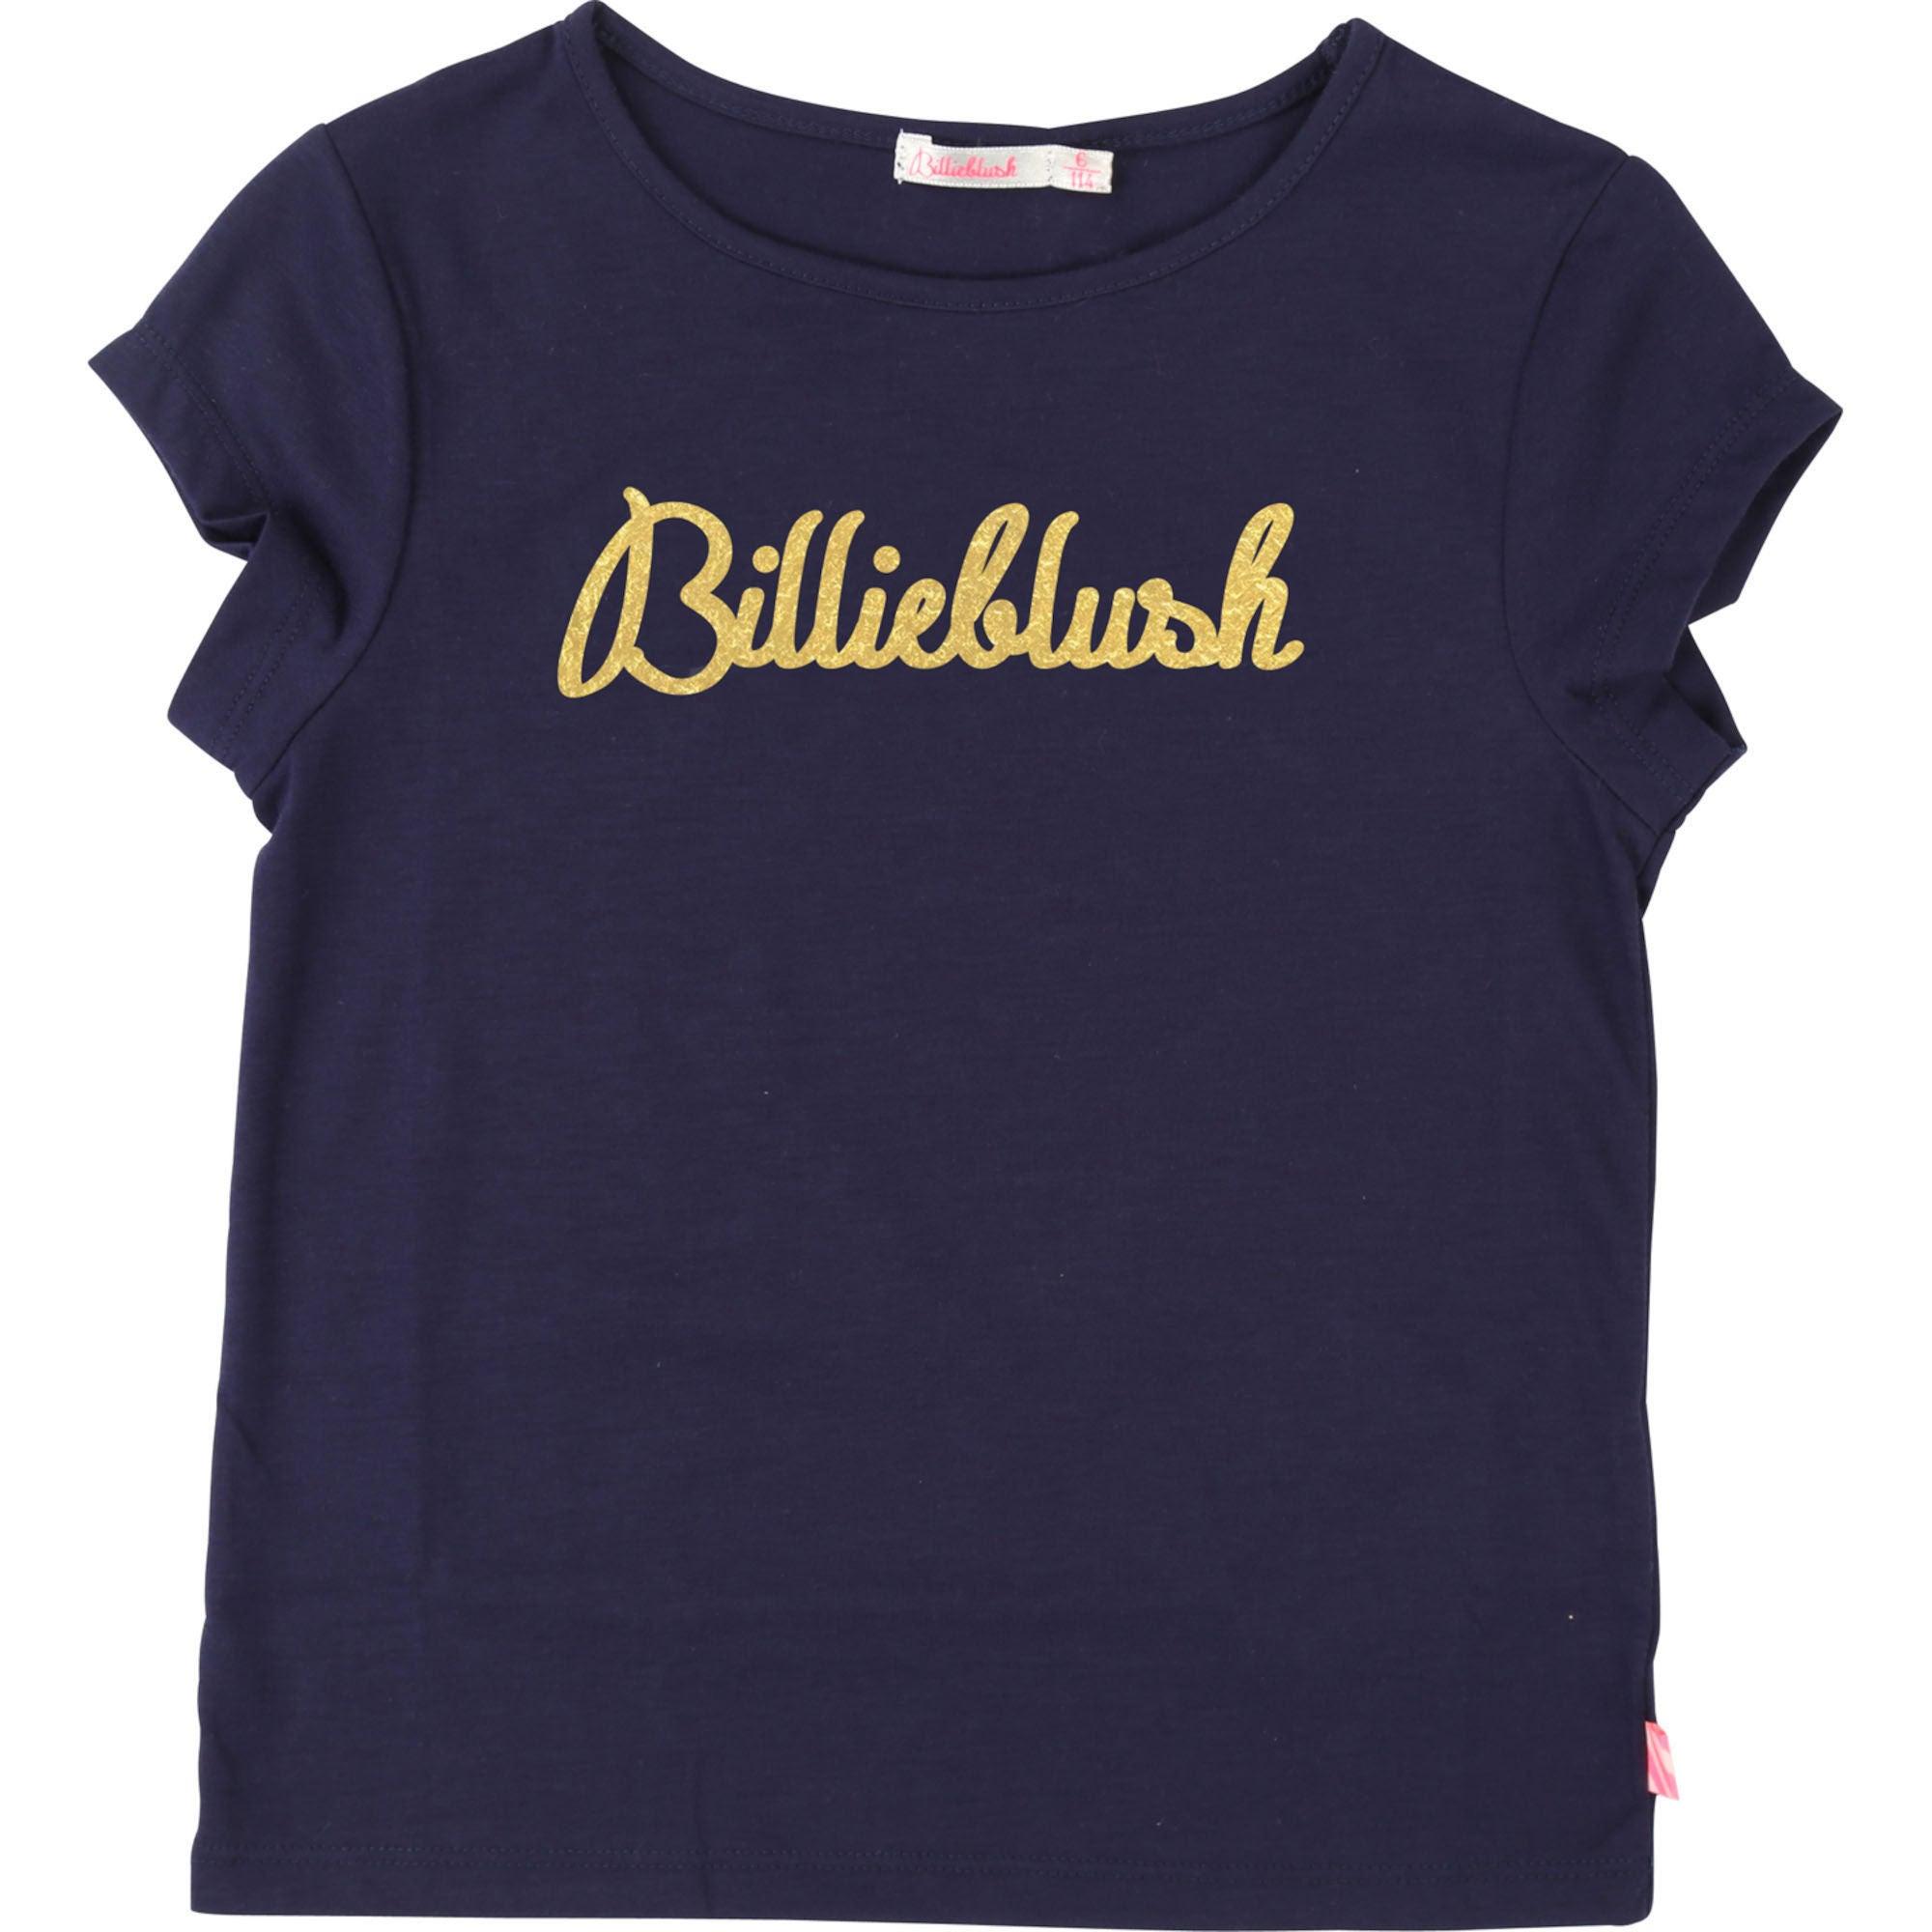 Billieblush T-Shirt, Navy 4år